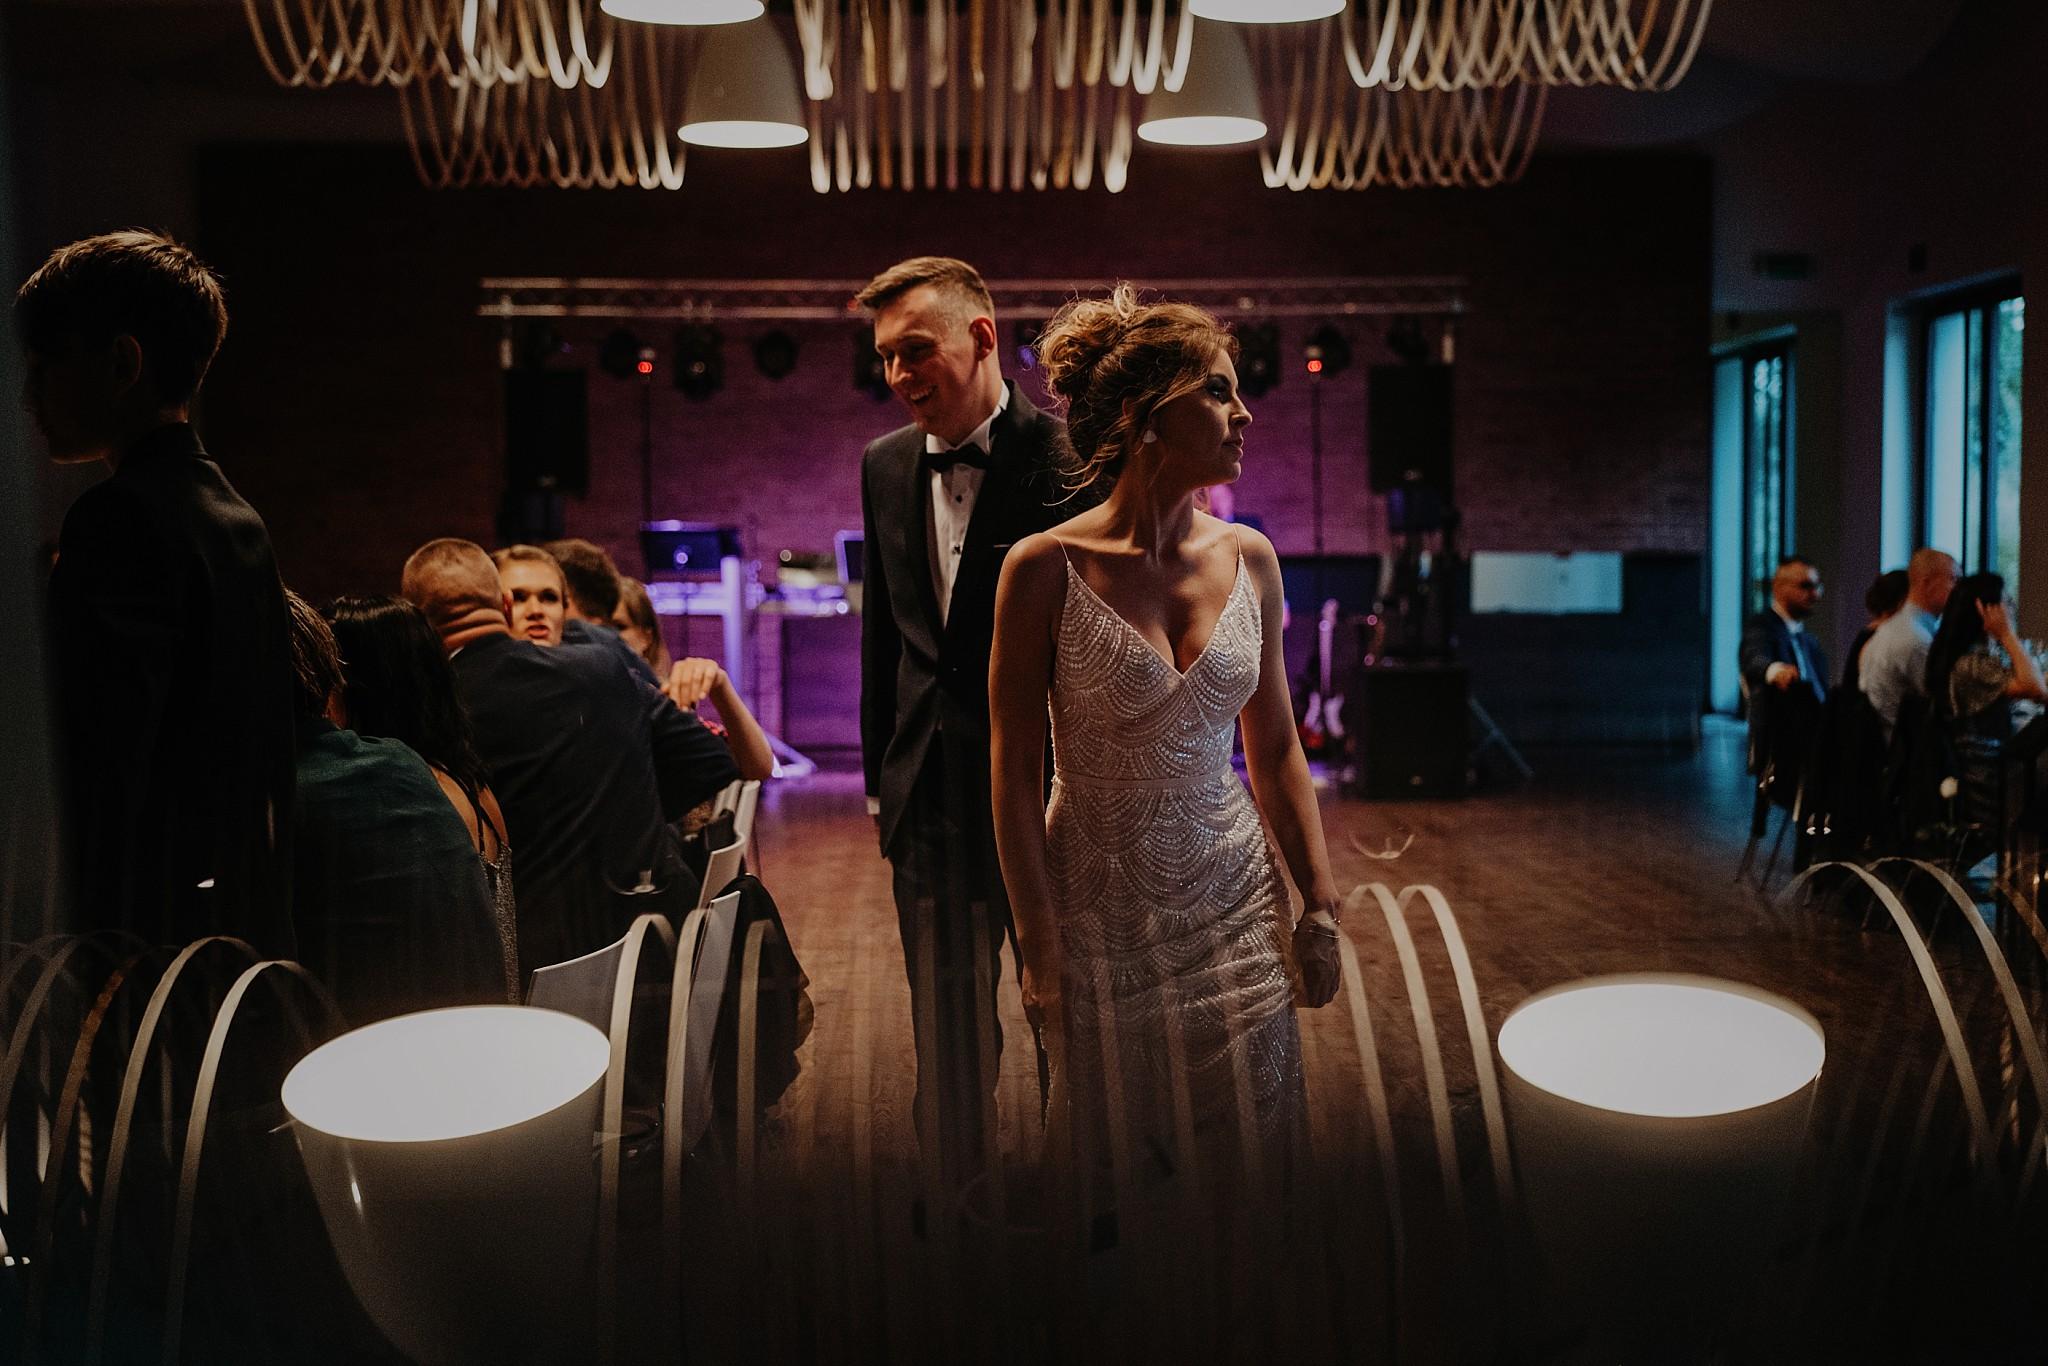 fotograf poznan wesele dobra truskawka piekne wesele pod poznaniem wesele w dobrej truskawce piekna para mloda slub marzen slub koronawirus slub listopad wesele koronawirus 328